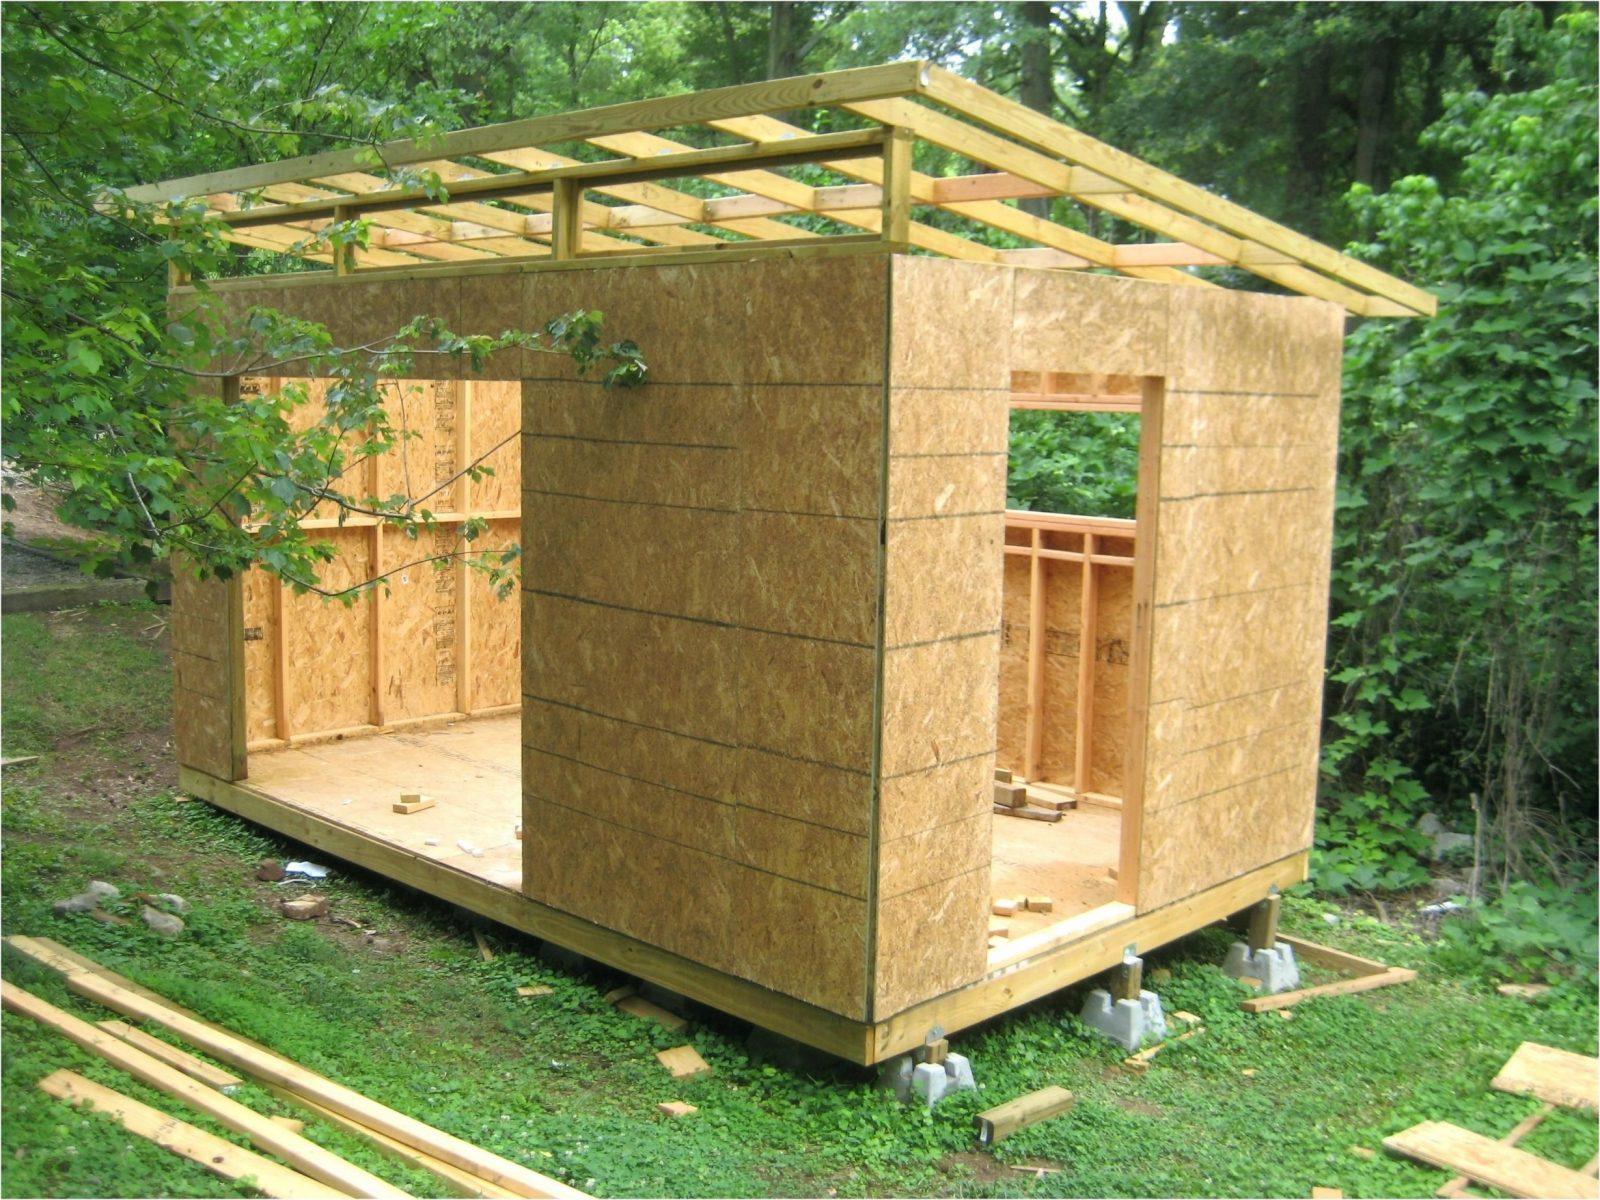 Bauanleitung Gartenhaus Terrassena Berdachung Genial Karibu Selber von Pultdach Garage Selber Bauen Photo